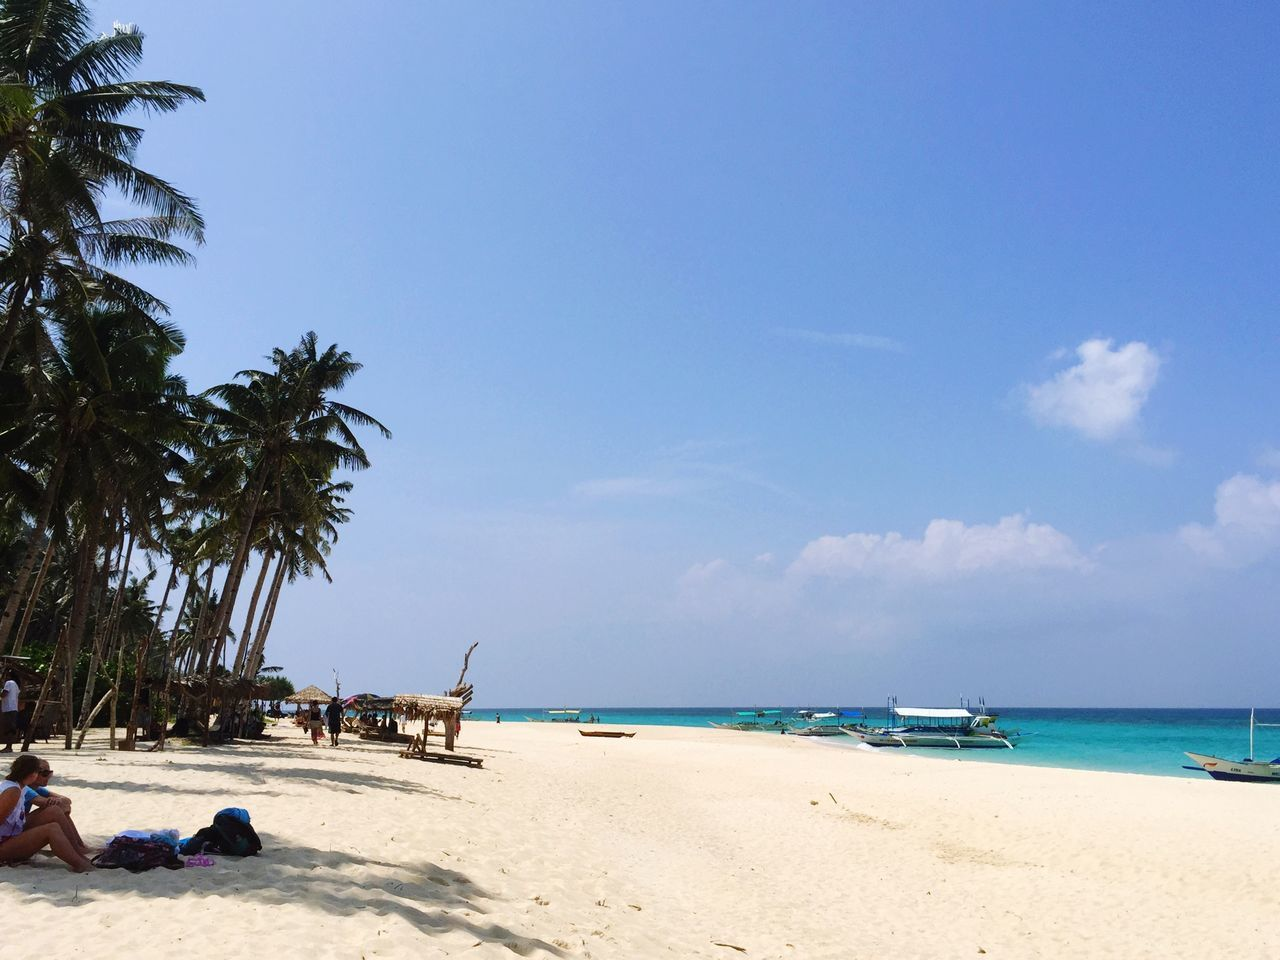 My Favorite Place . Boracay Island, Philippines Kula Beach Holiday Calm